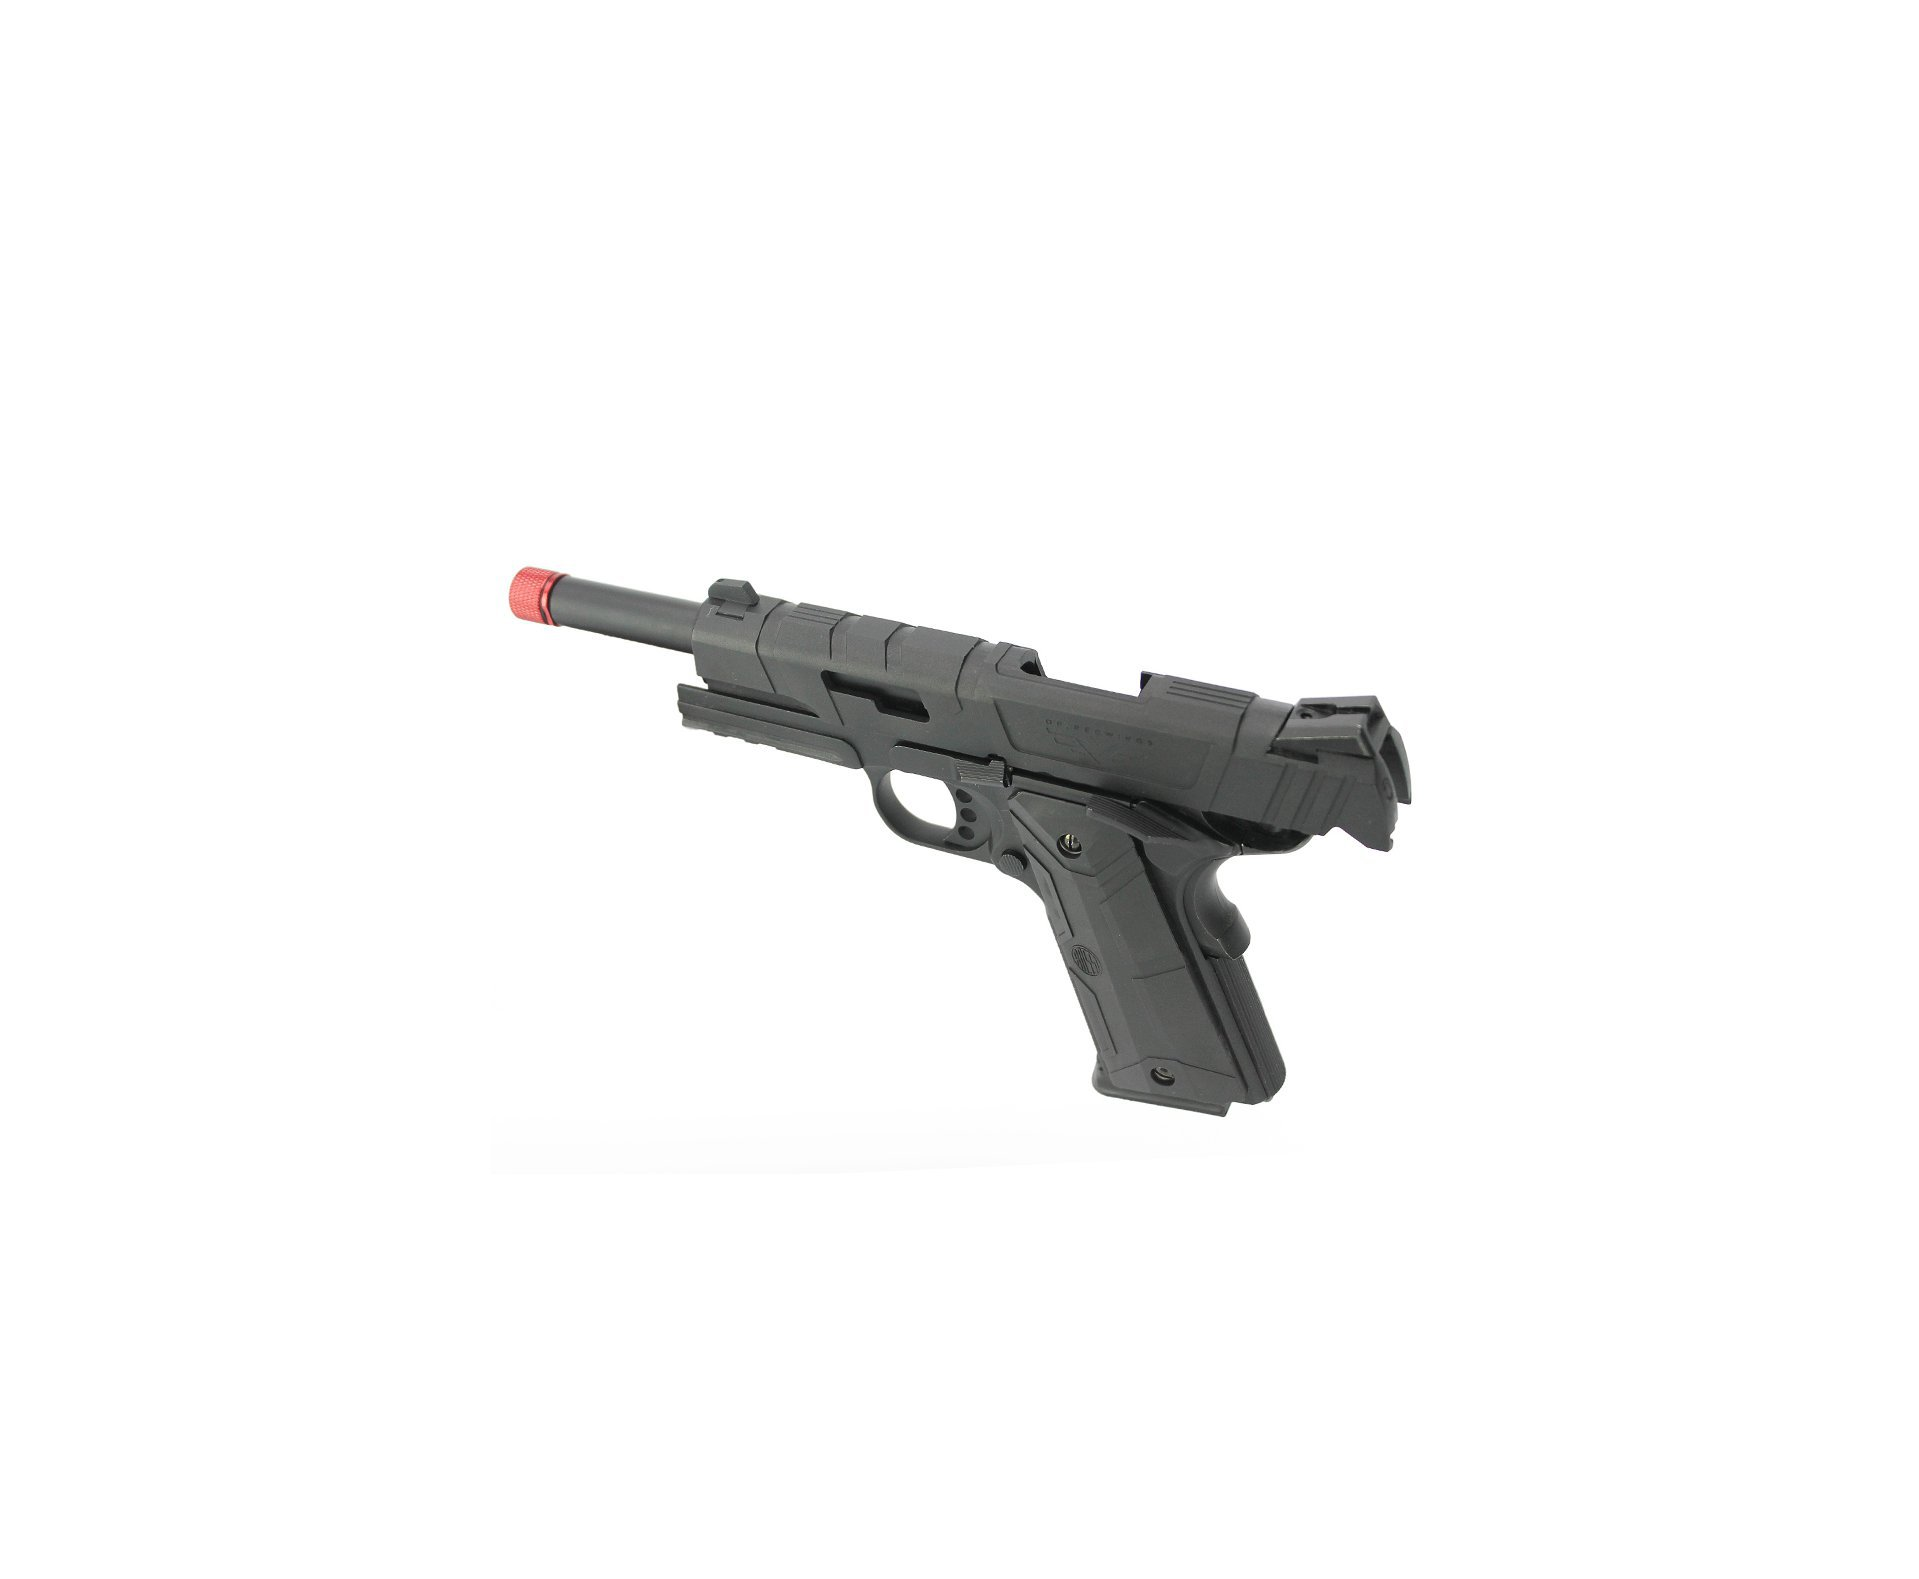 Pistola De Airsoft Gbb 1911 Black Devil 5.1 Blowback Neptune Rossi 6mm